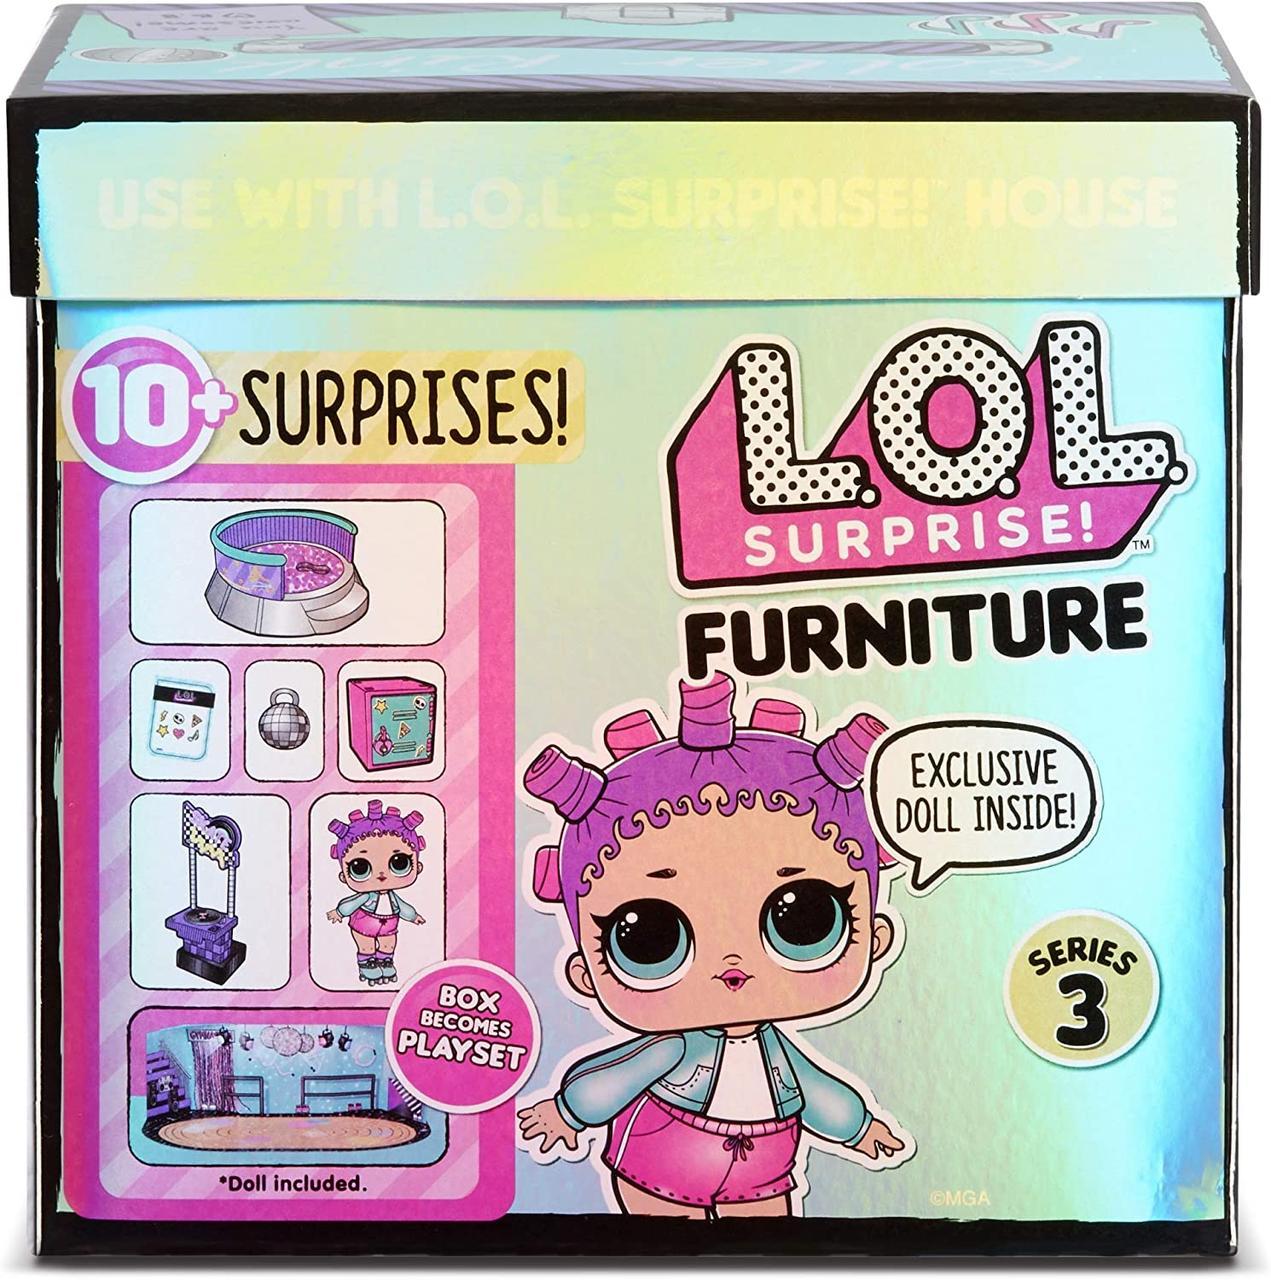 Ігровий набір L.O.L. Surprise! стильний інтер'єр Ролердром  Furniture Roller Rink with Roller Skater Doll